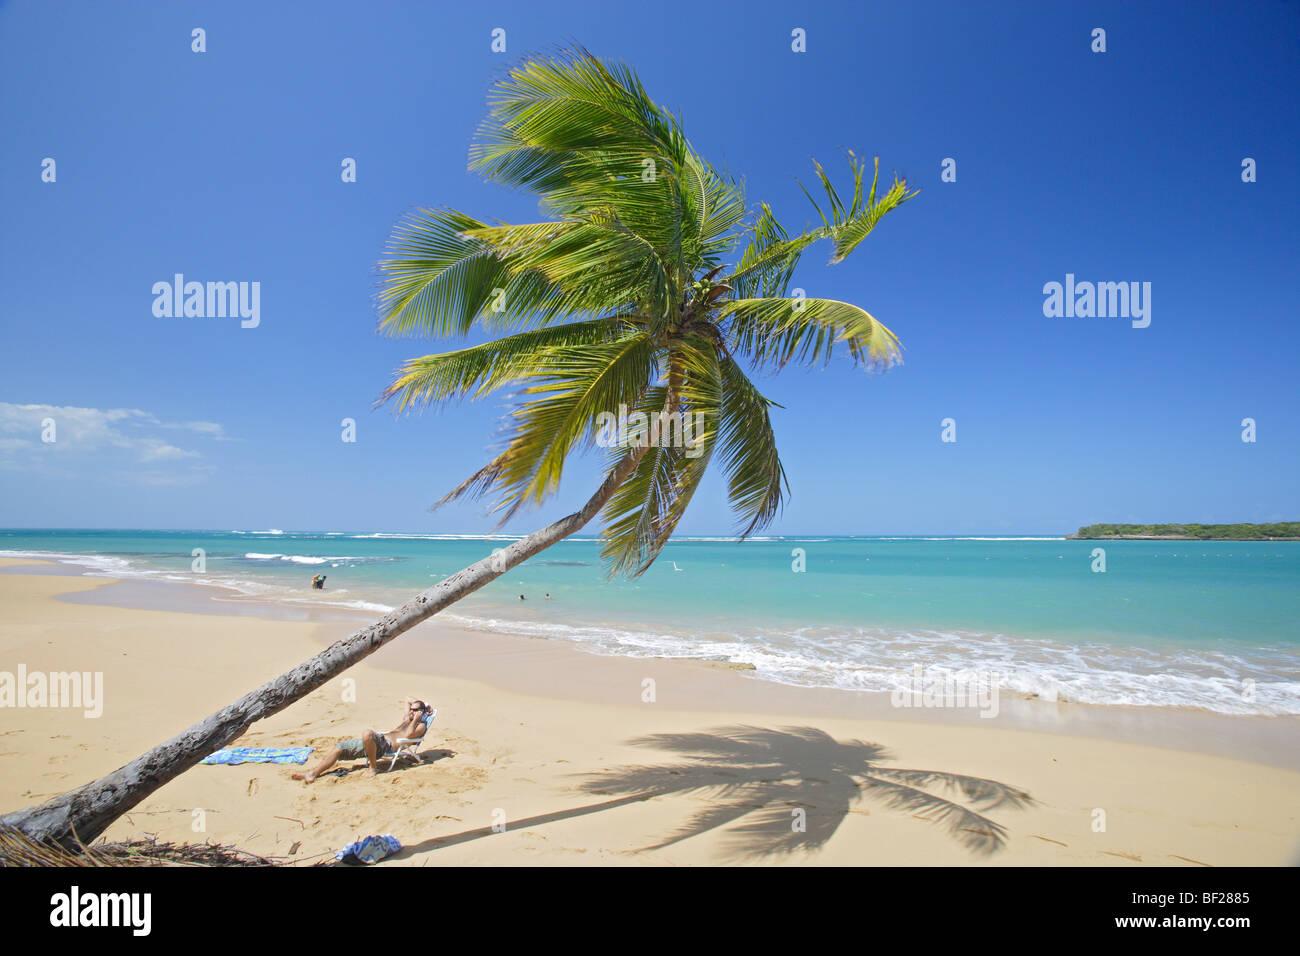 Man and palm tree at Tres Palmitas beach under blue sky, Puerto Rico, Carribean, America - Stock Image